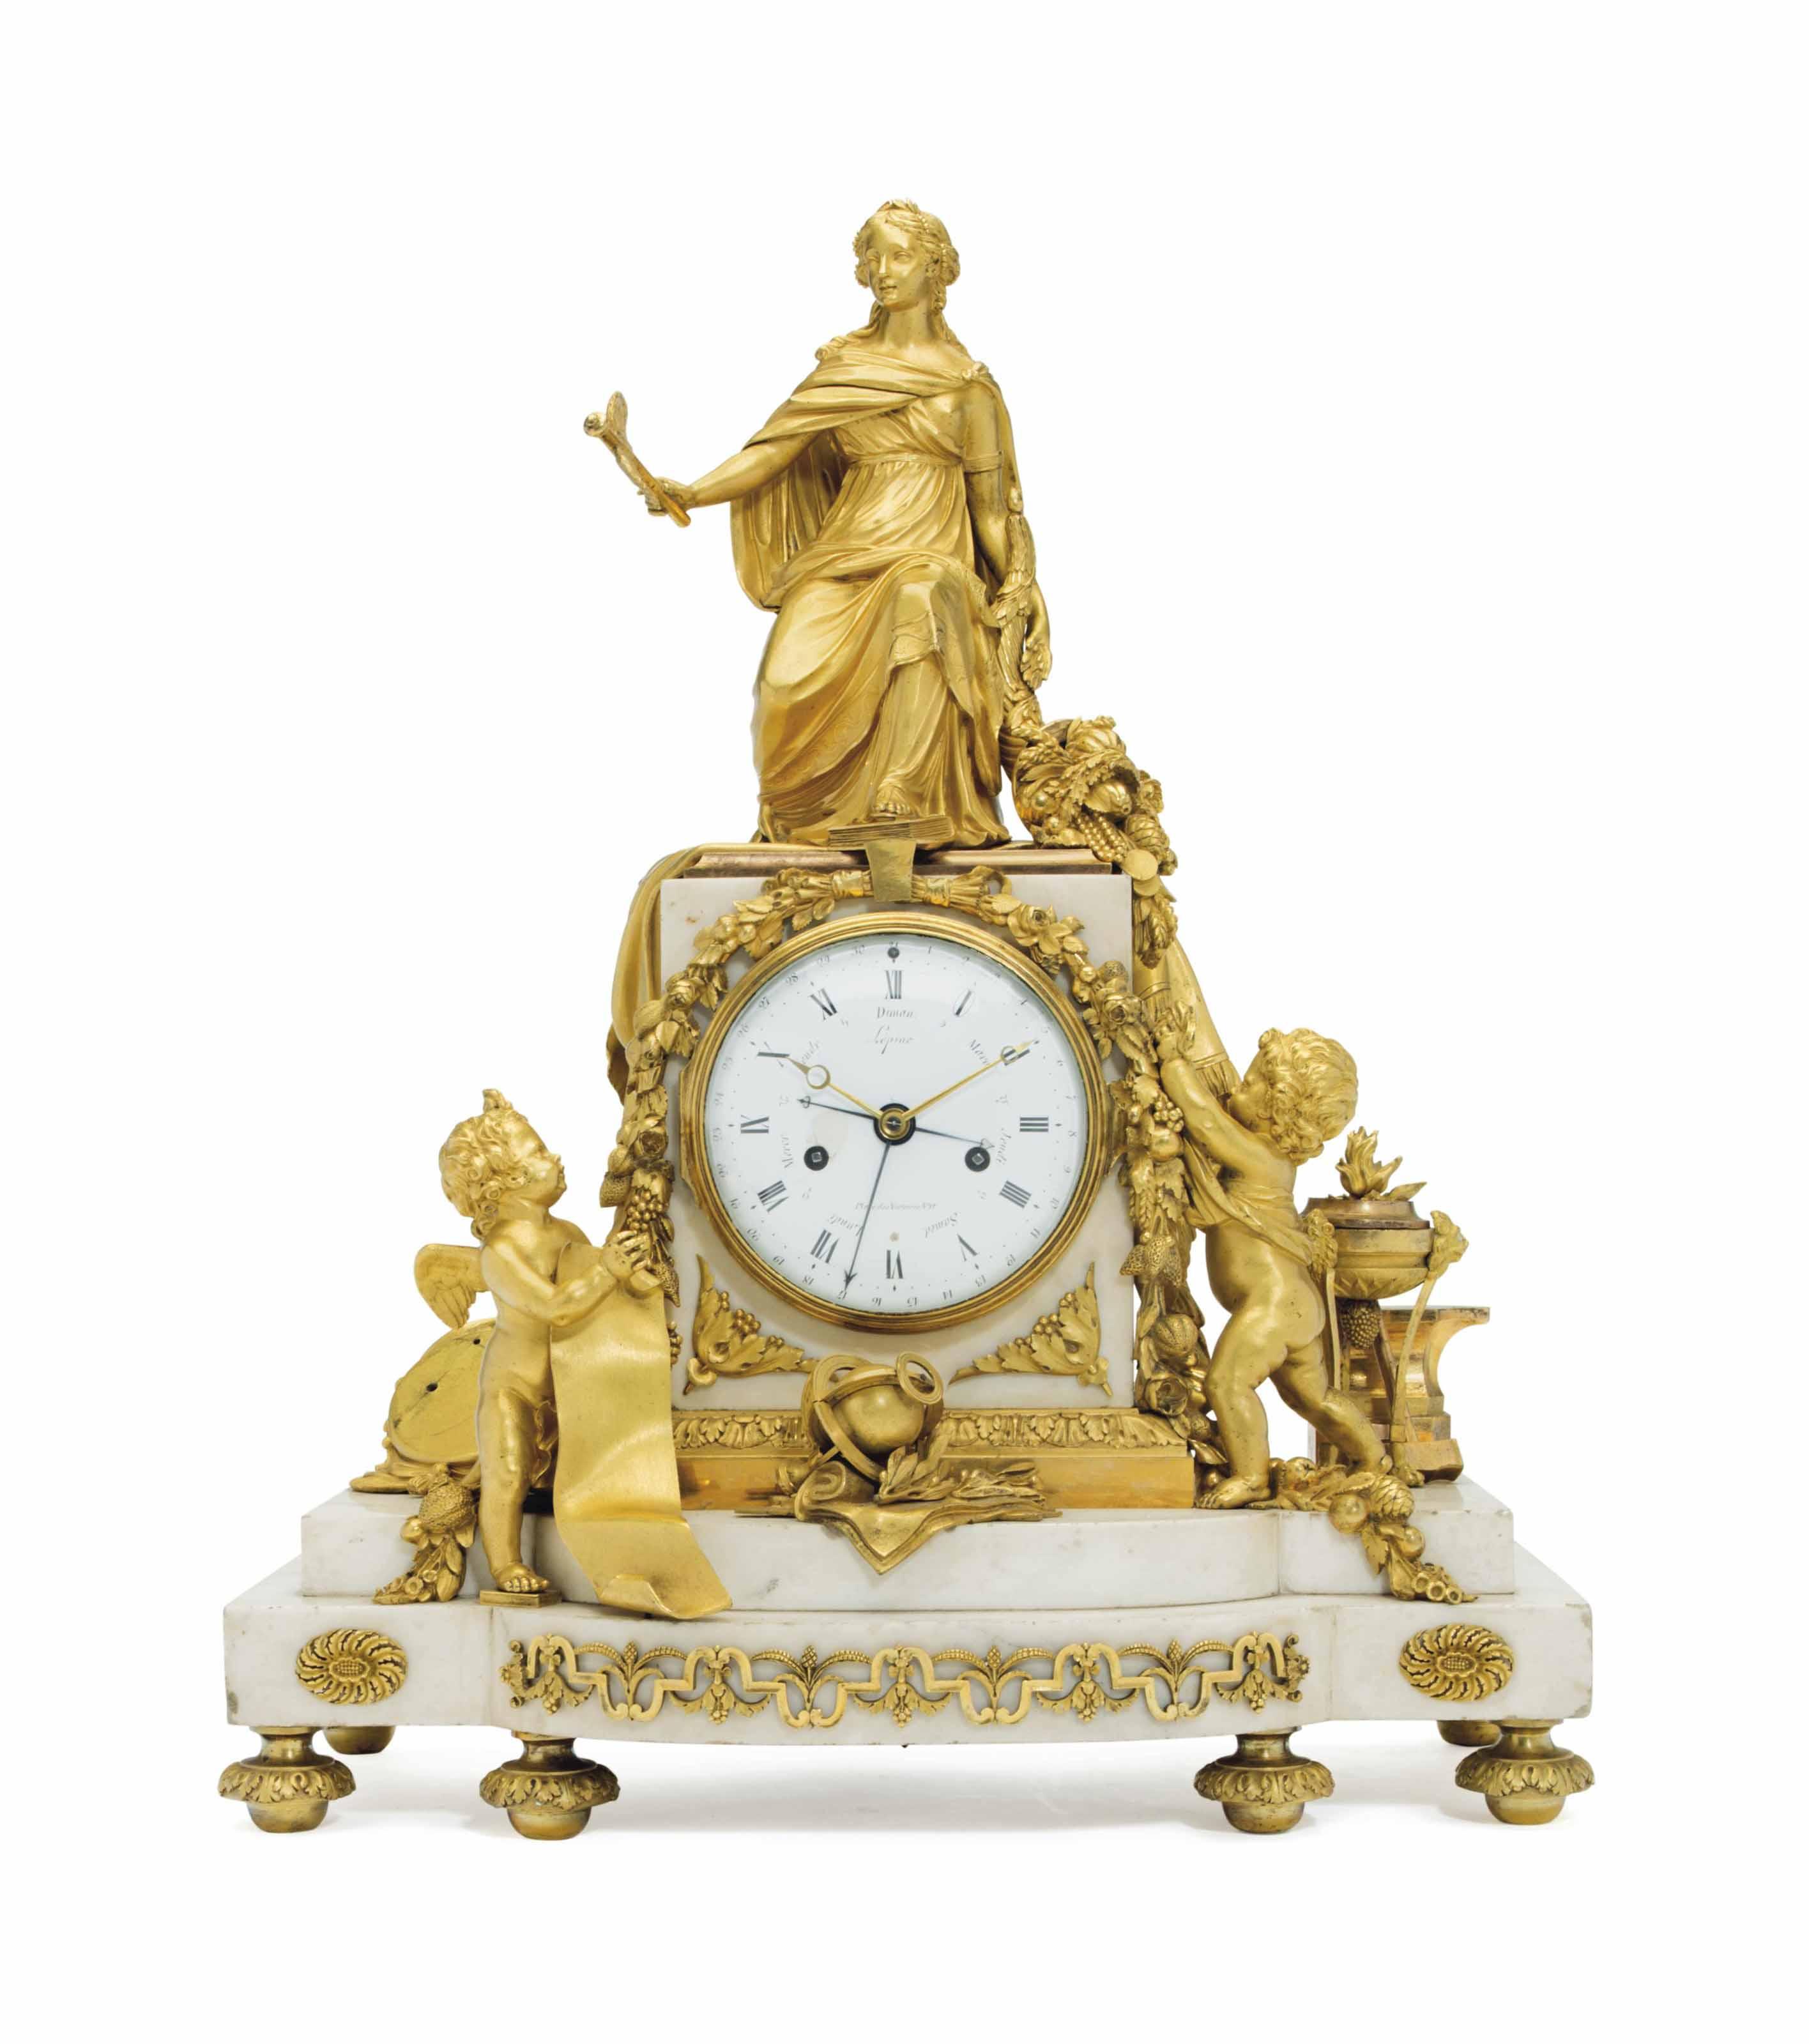 A LOUIS XVI TWO-TONE ORMOLU AND WHITE MARBLE MANTEL CLOCK